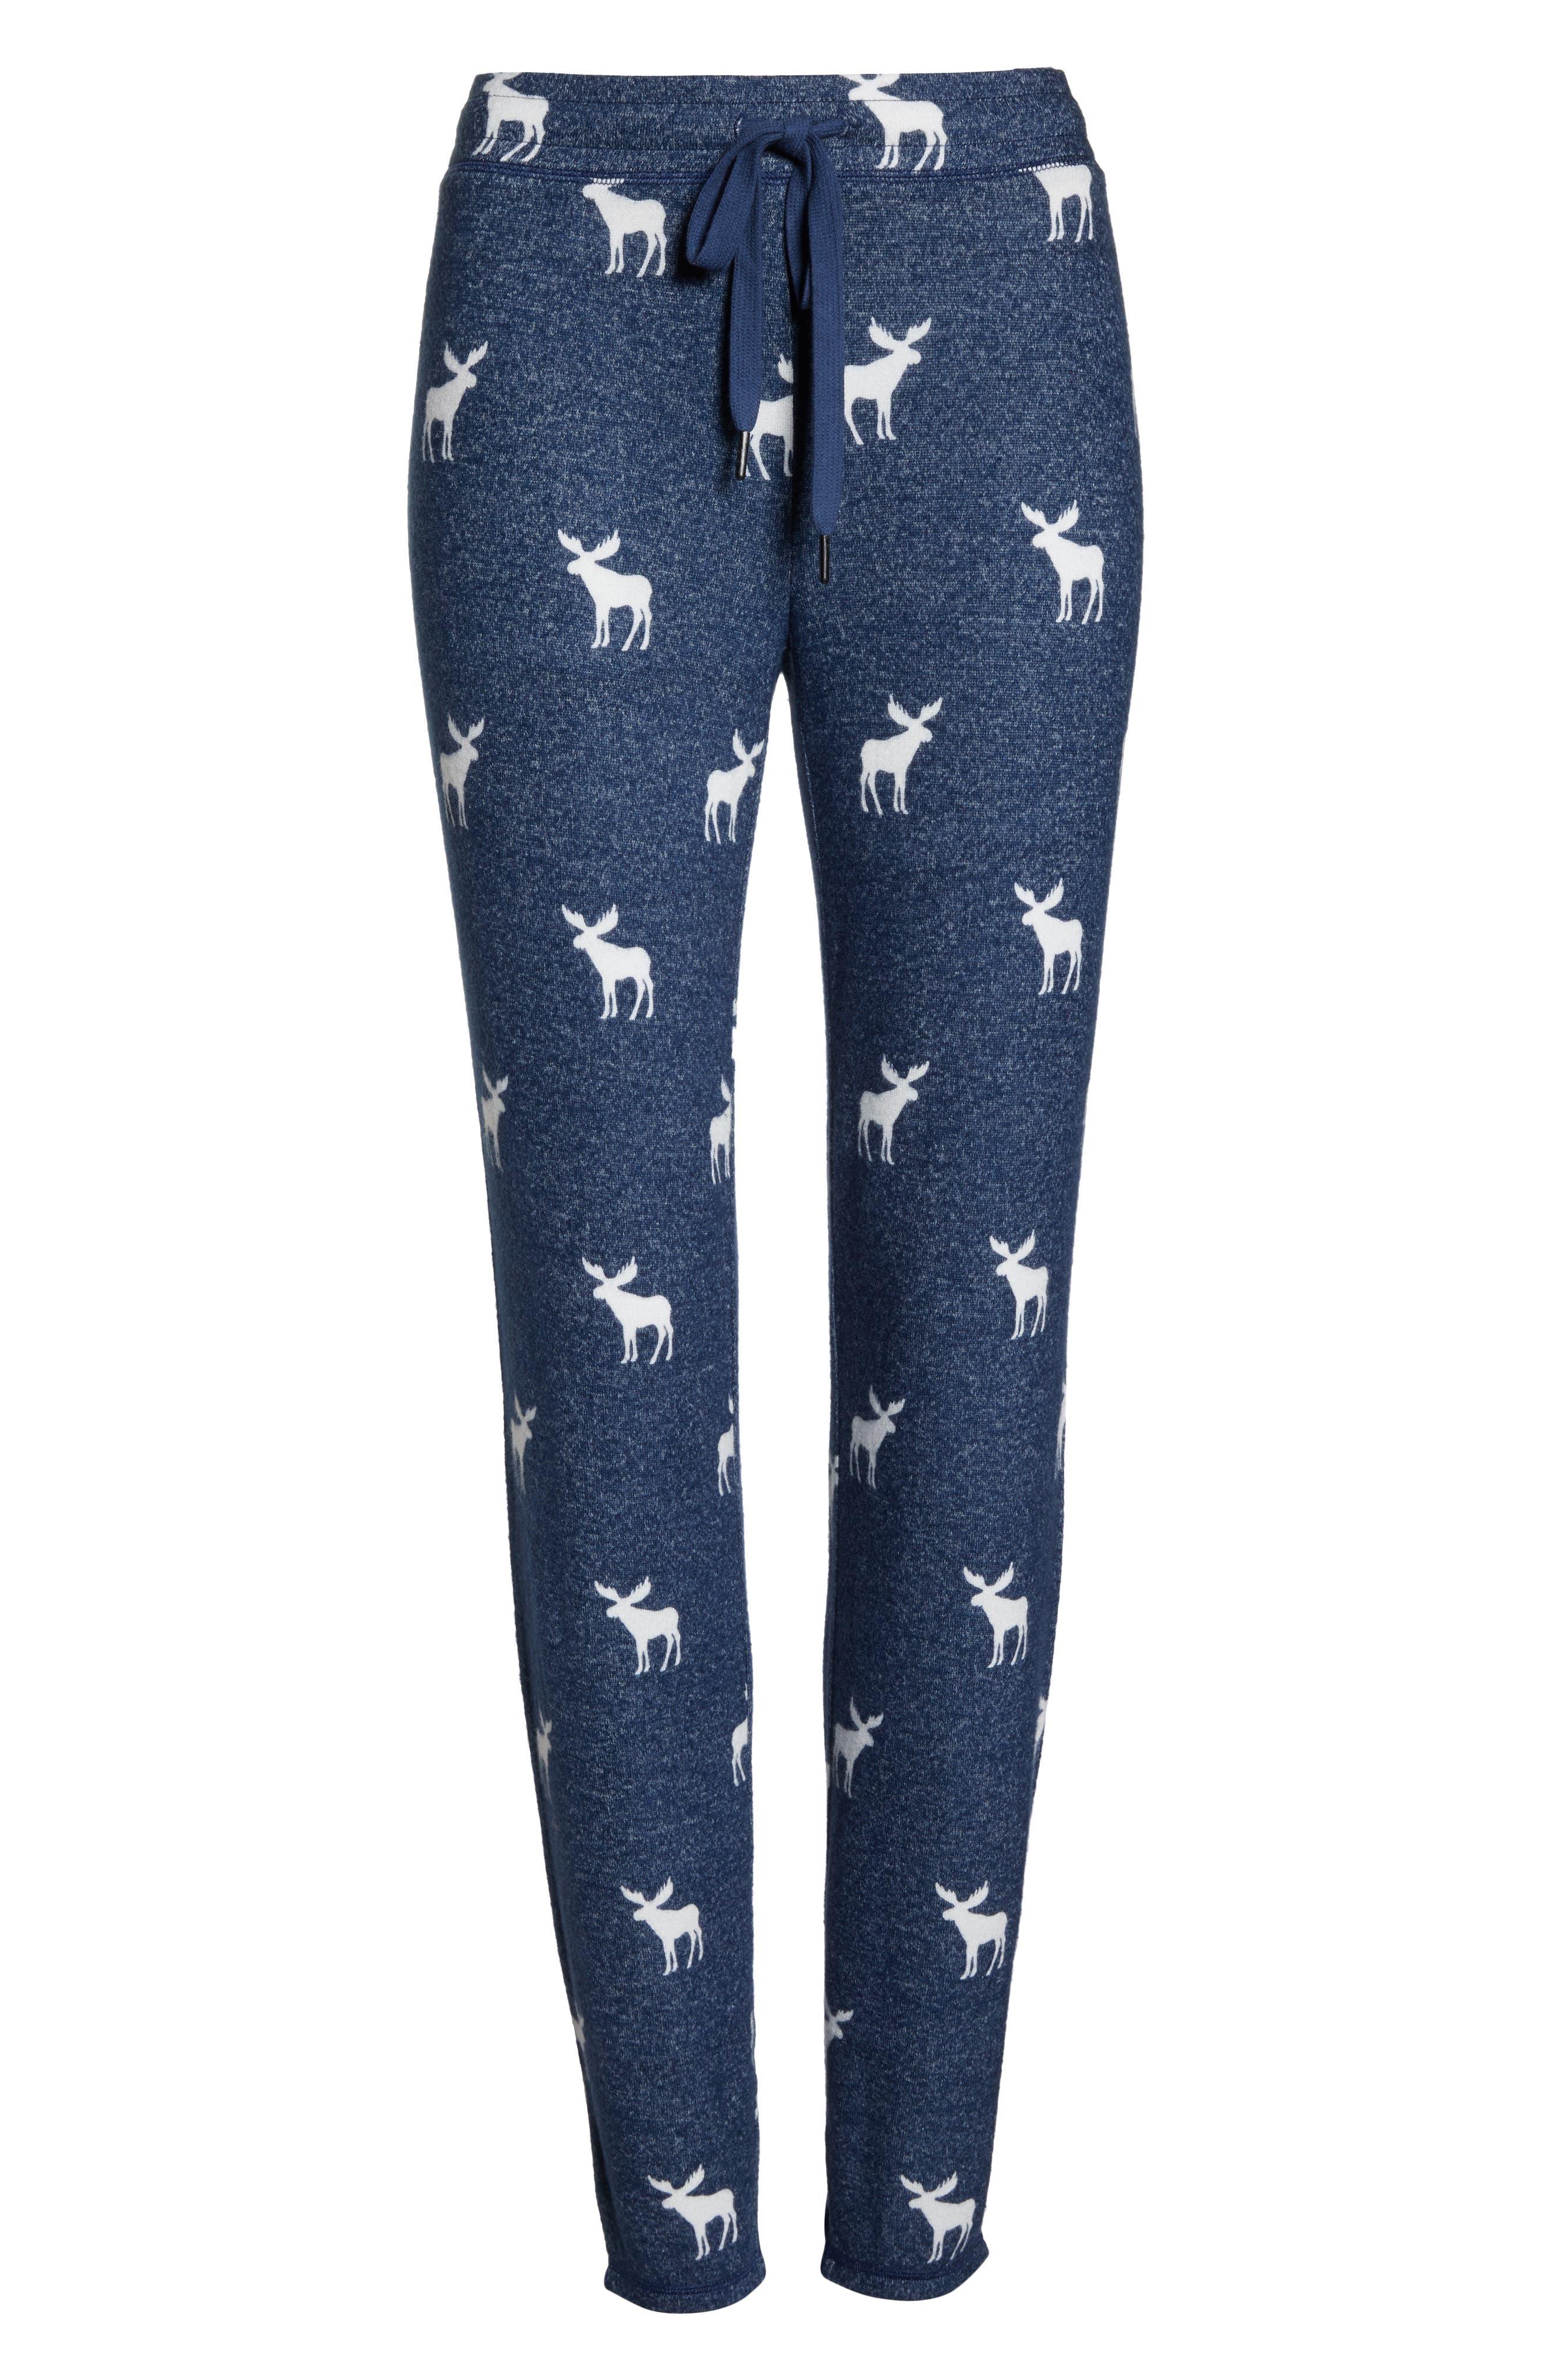 Moose Print Banded Pajama Pants,                             Alternate thumbnail 6, color,                             410